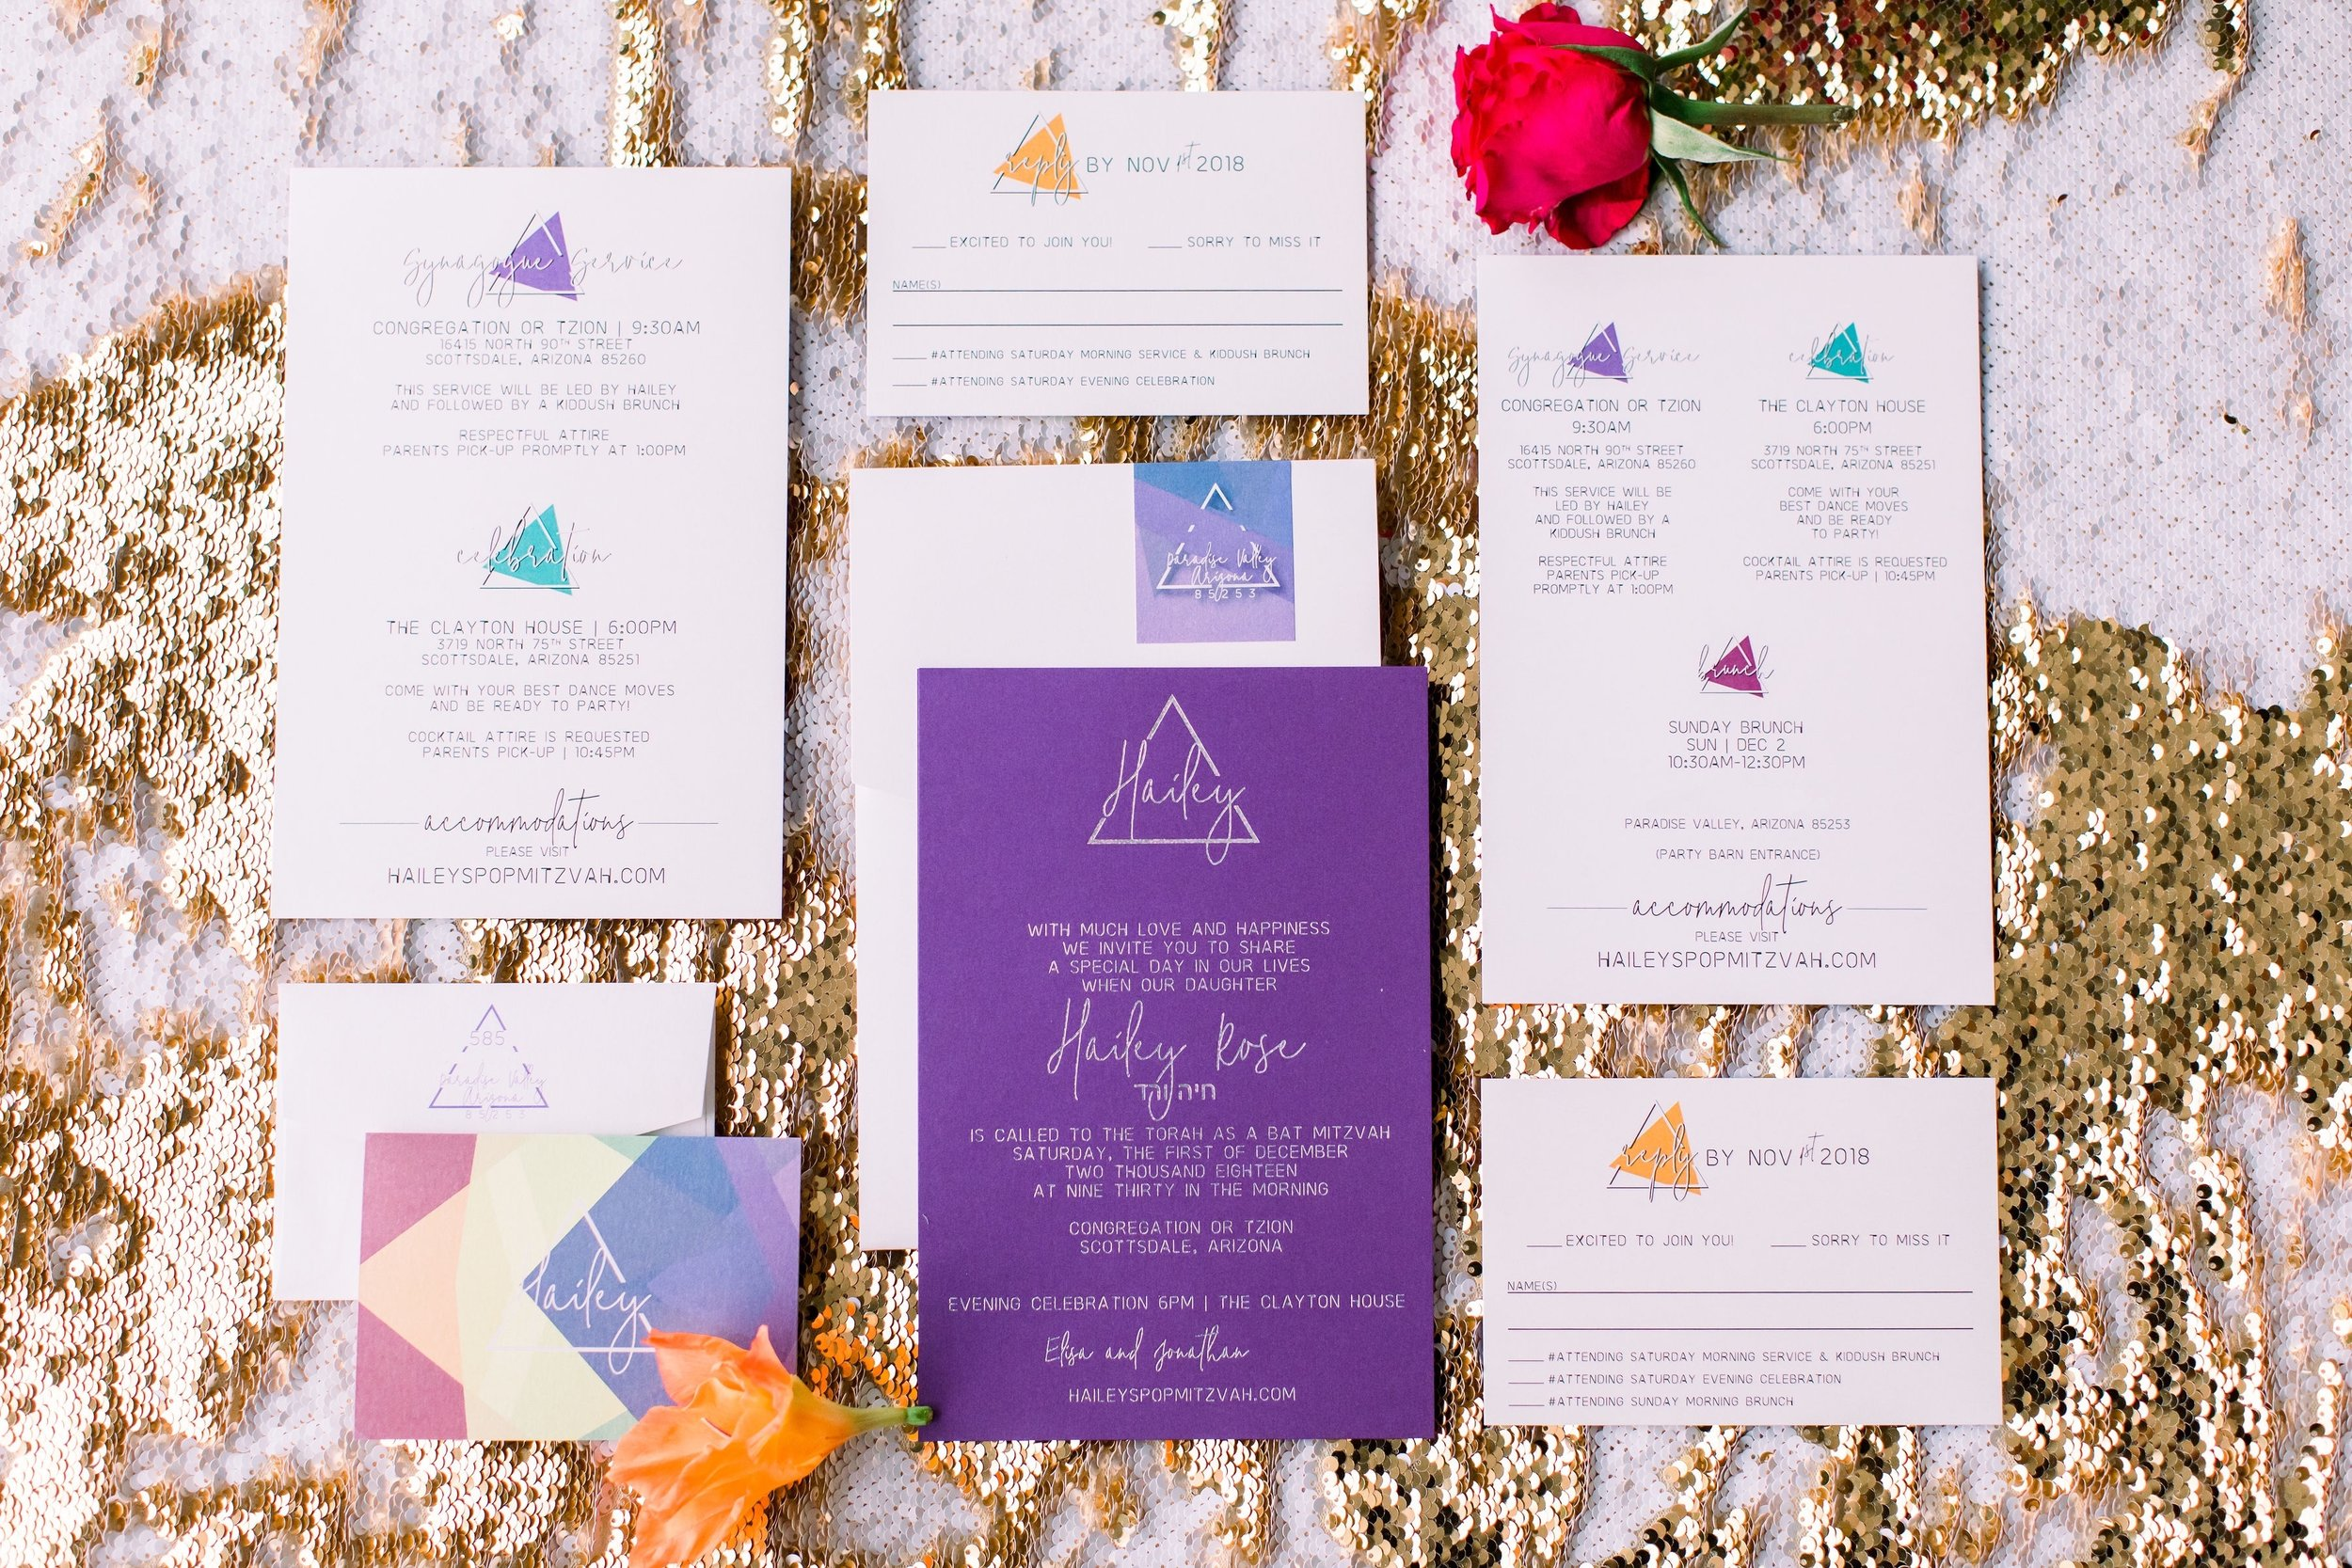 1 bat mitzvah invitation custom invitation suite rsvp card party invitation rainbow geometric invitation Life Design Events photos by Stephanie Heymann Photography.jpg